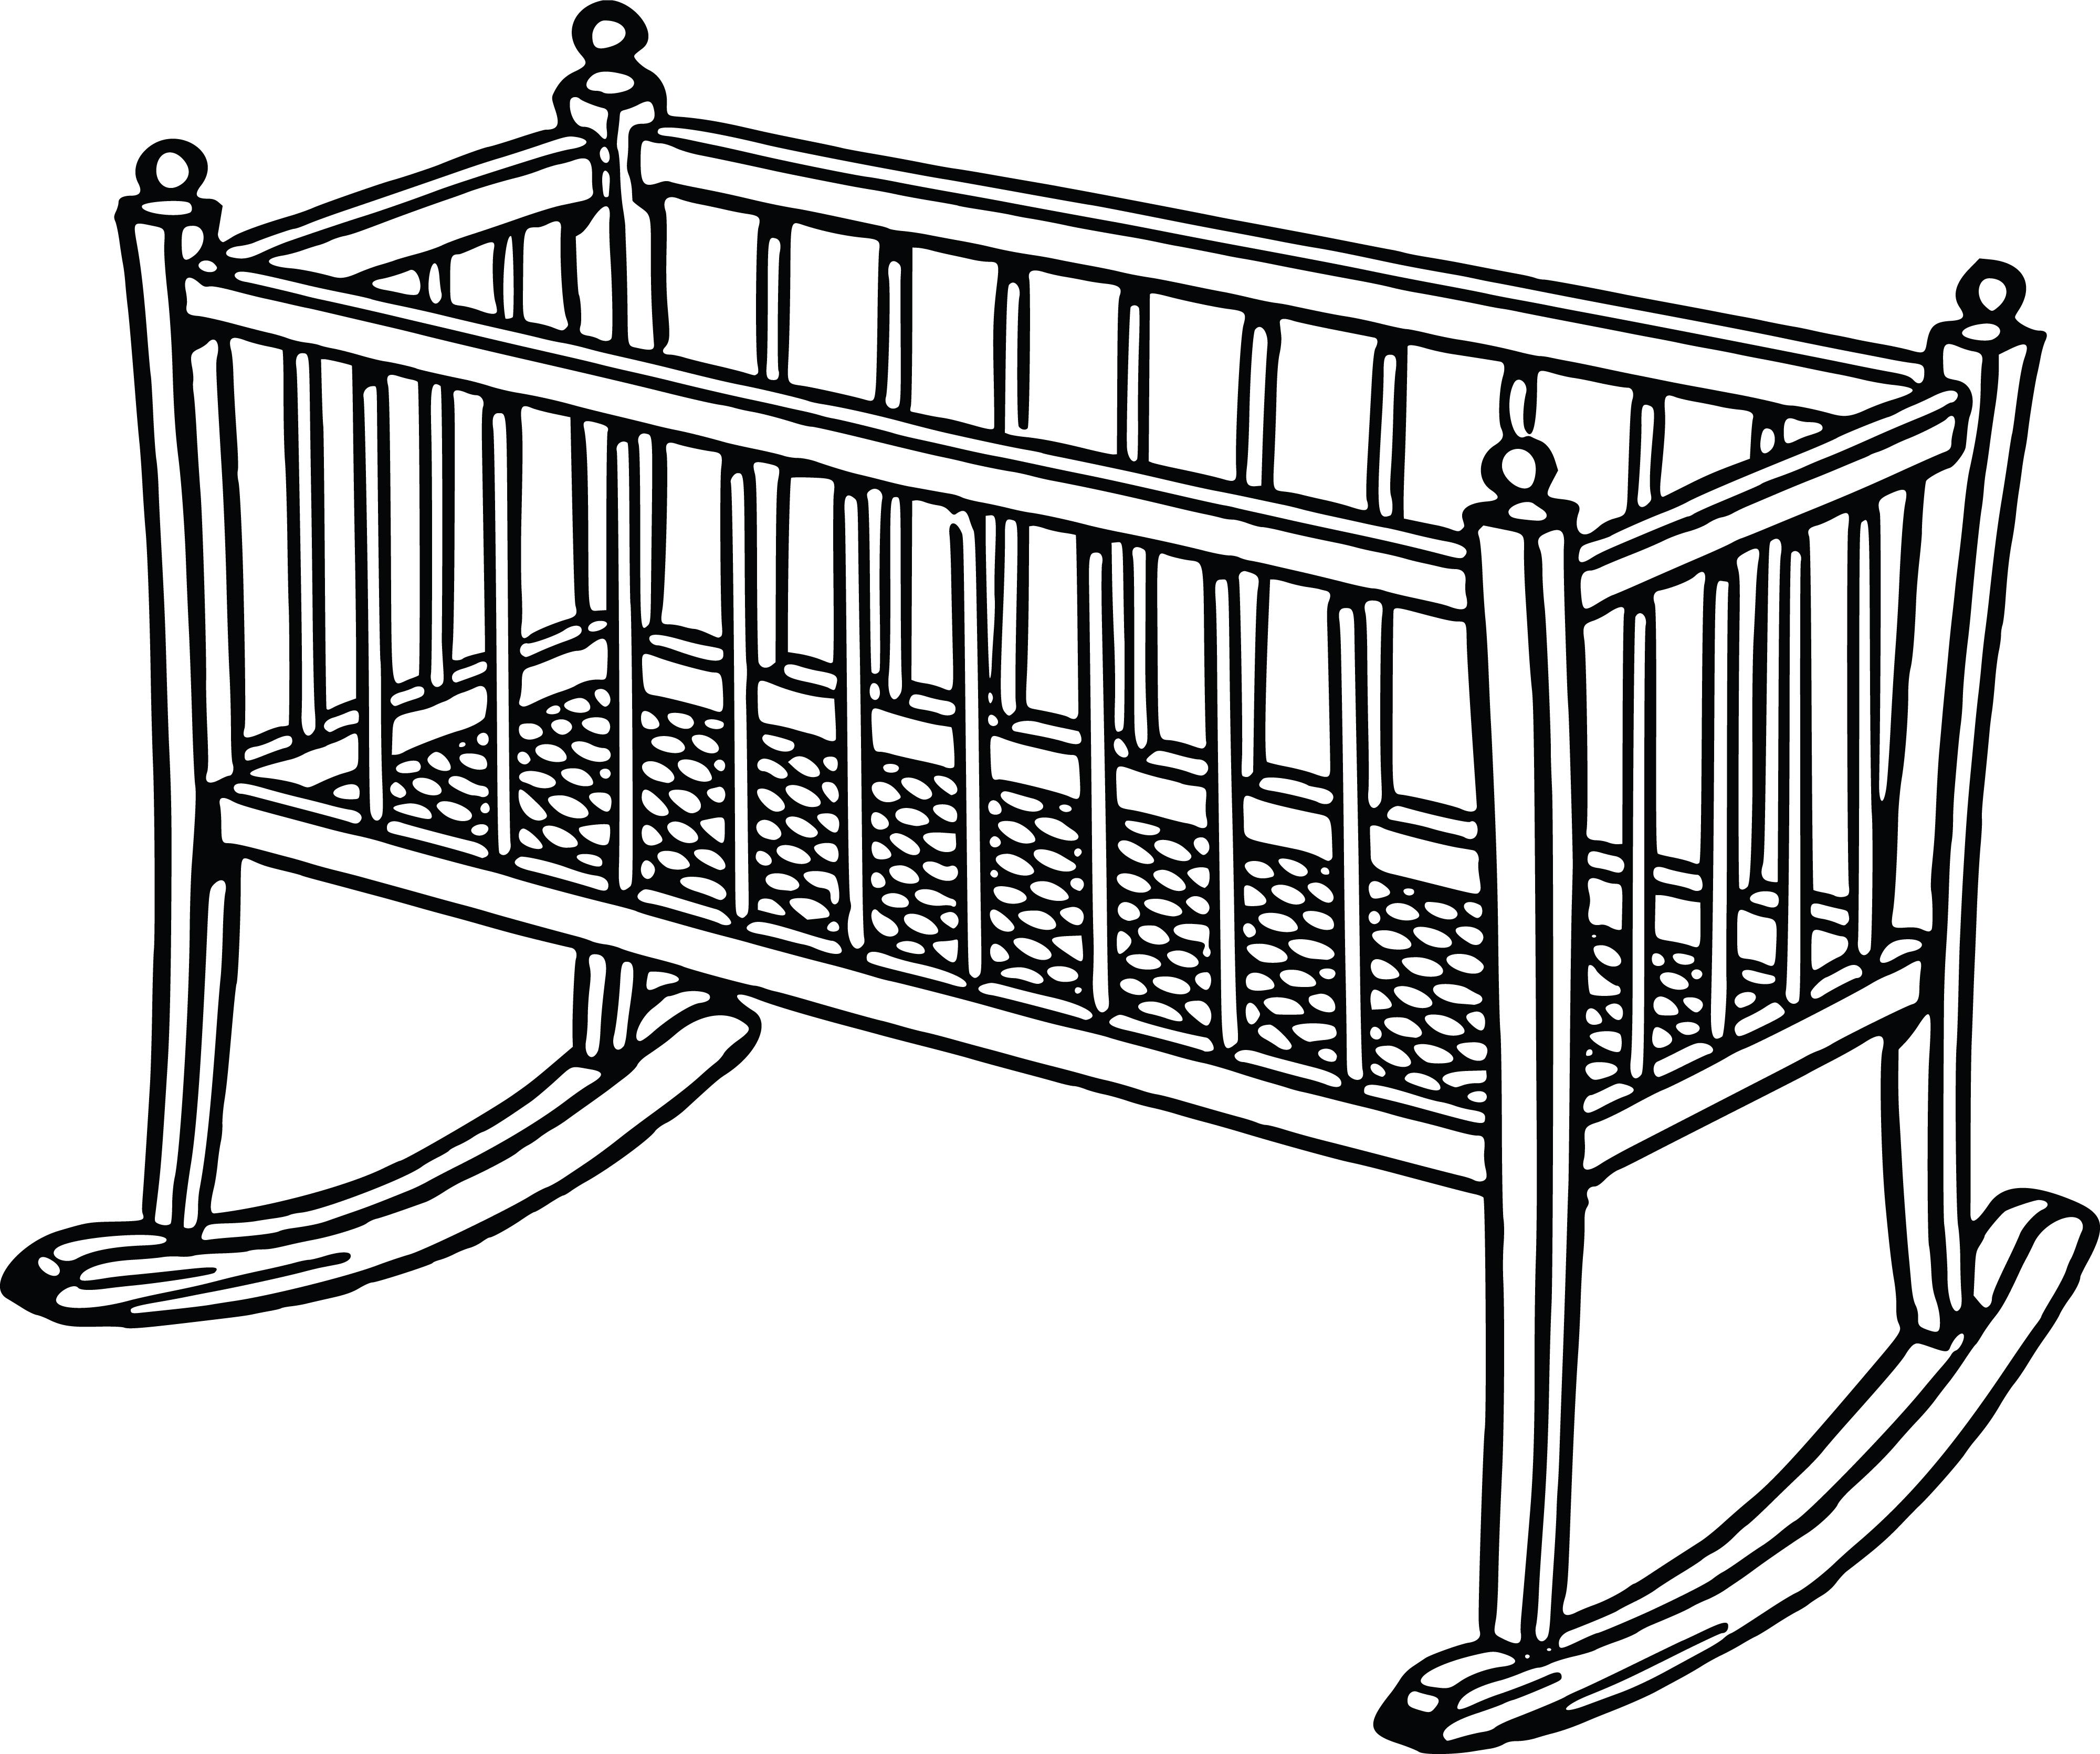 free clipart of a baby crib rh free clipartof com baby crib clipart free